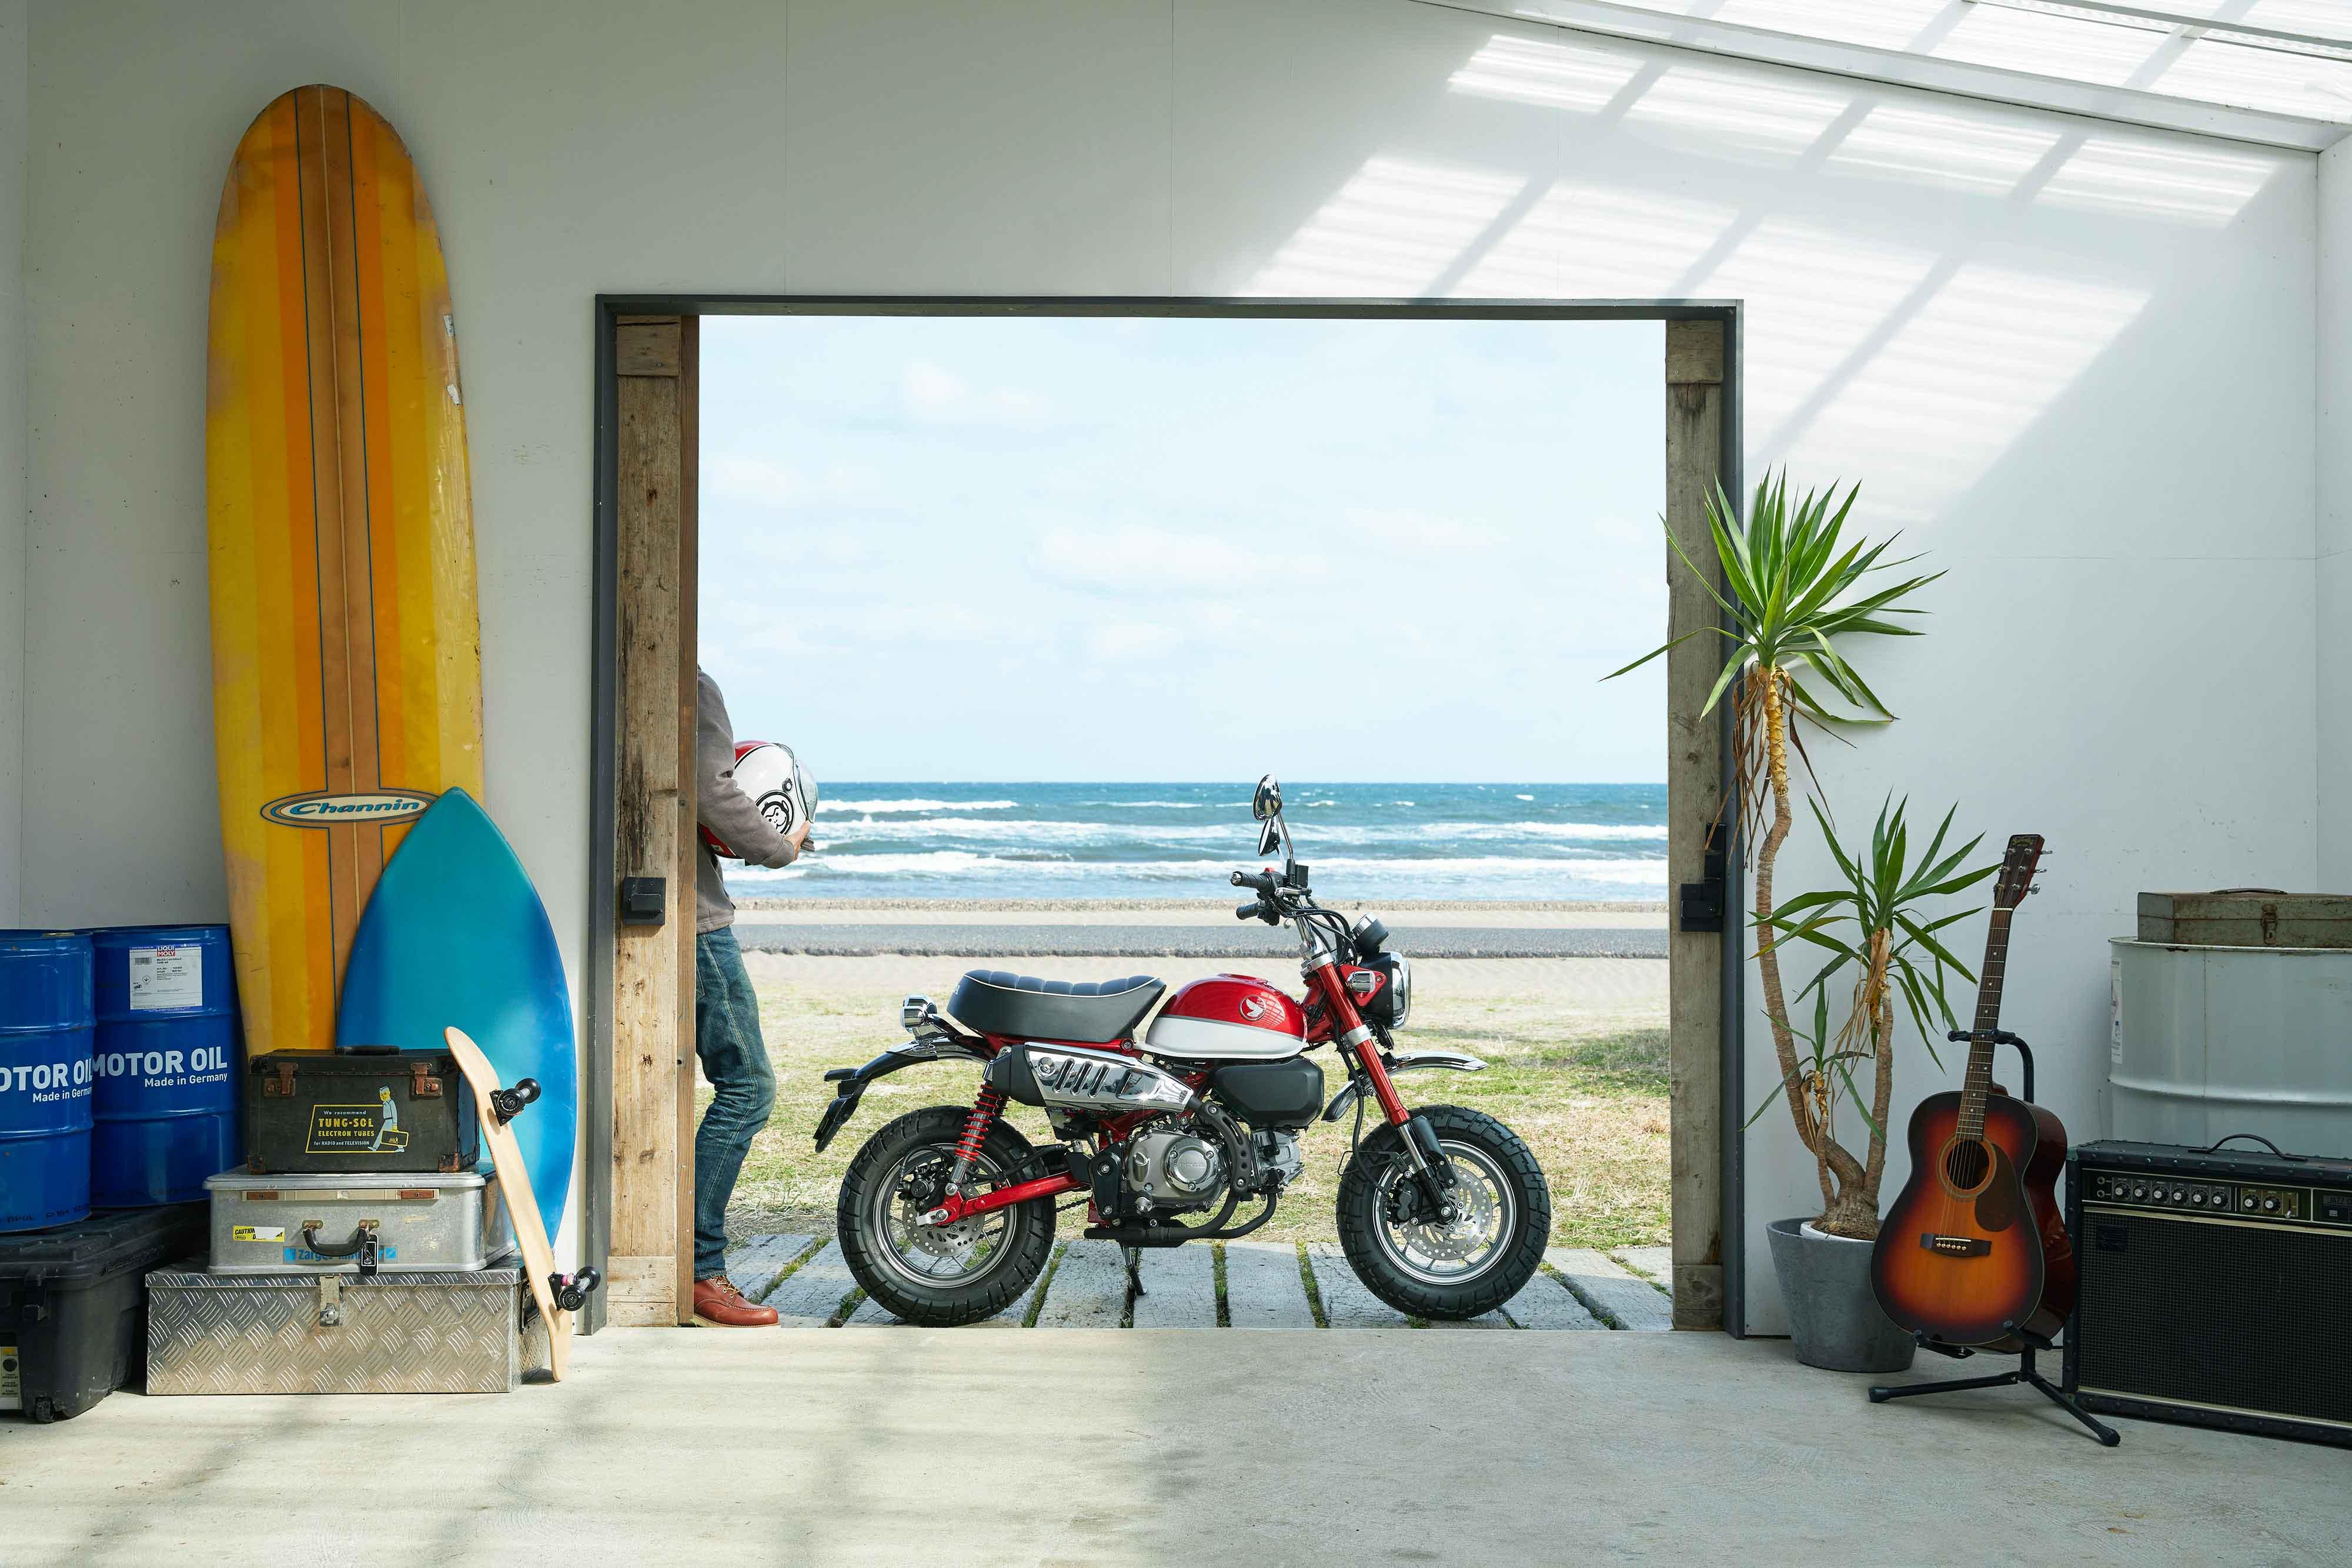 2019 Honda Monkey beach house